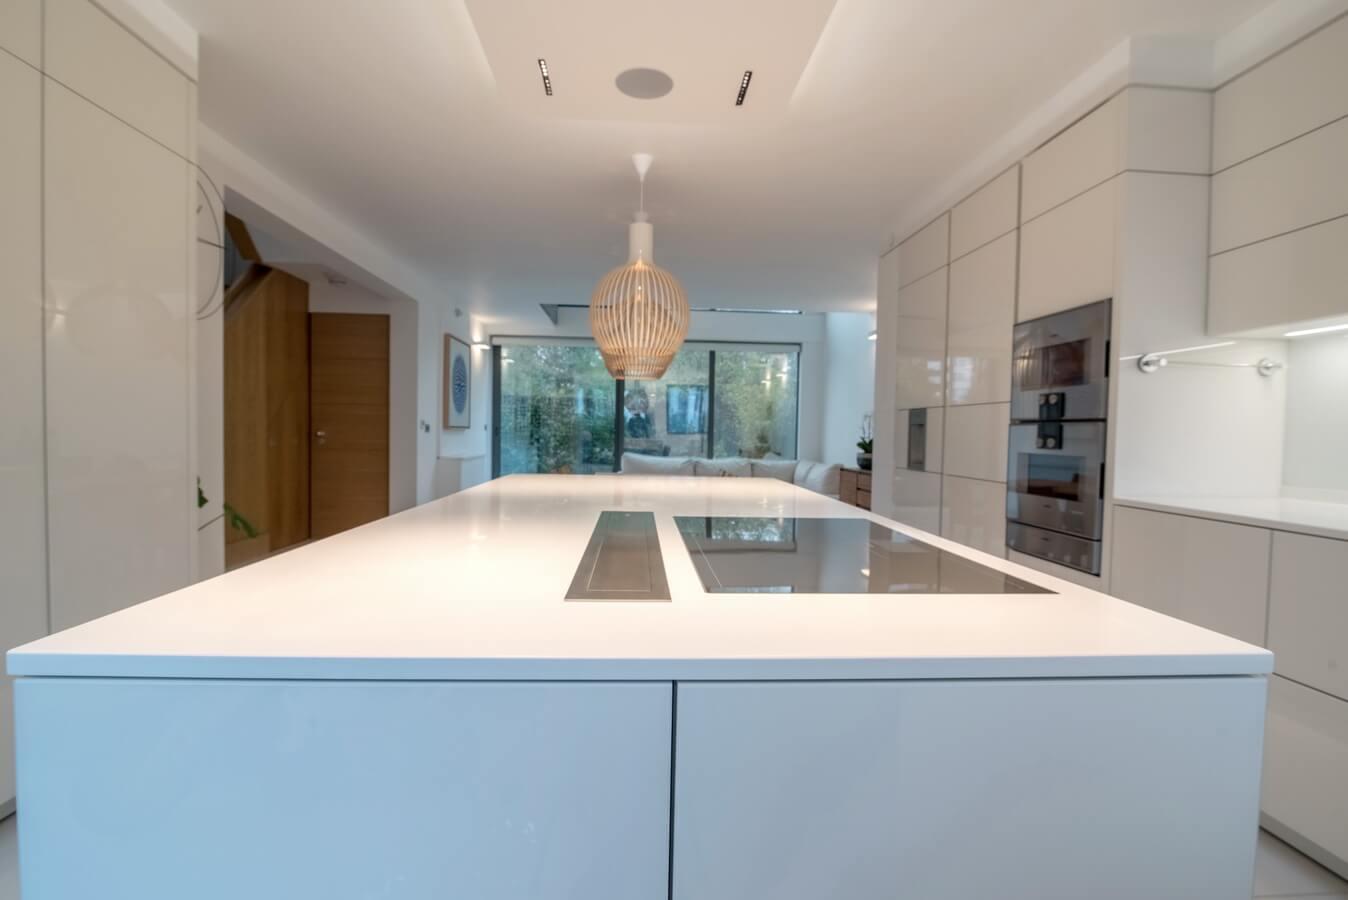 kitchen-island-hob-german-white-units.jpg